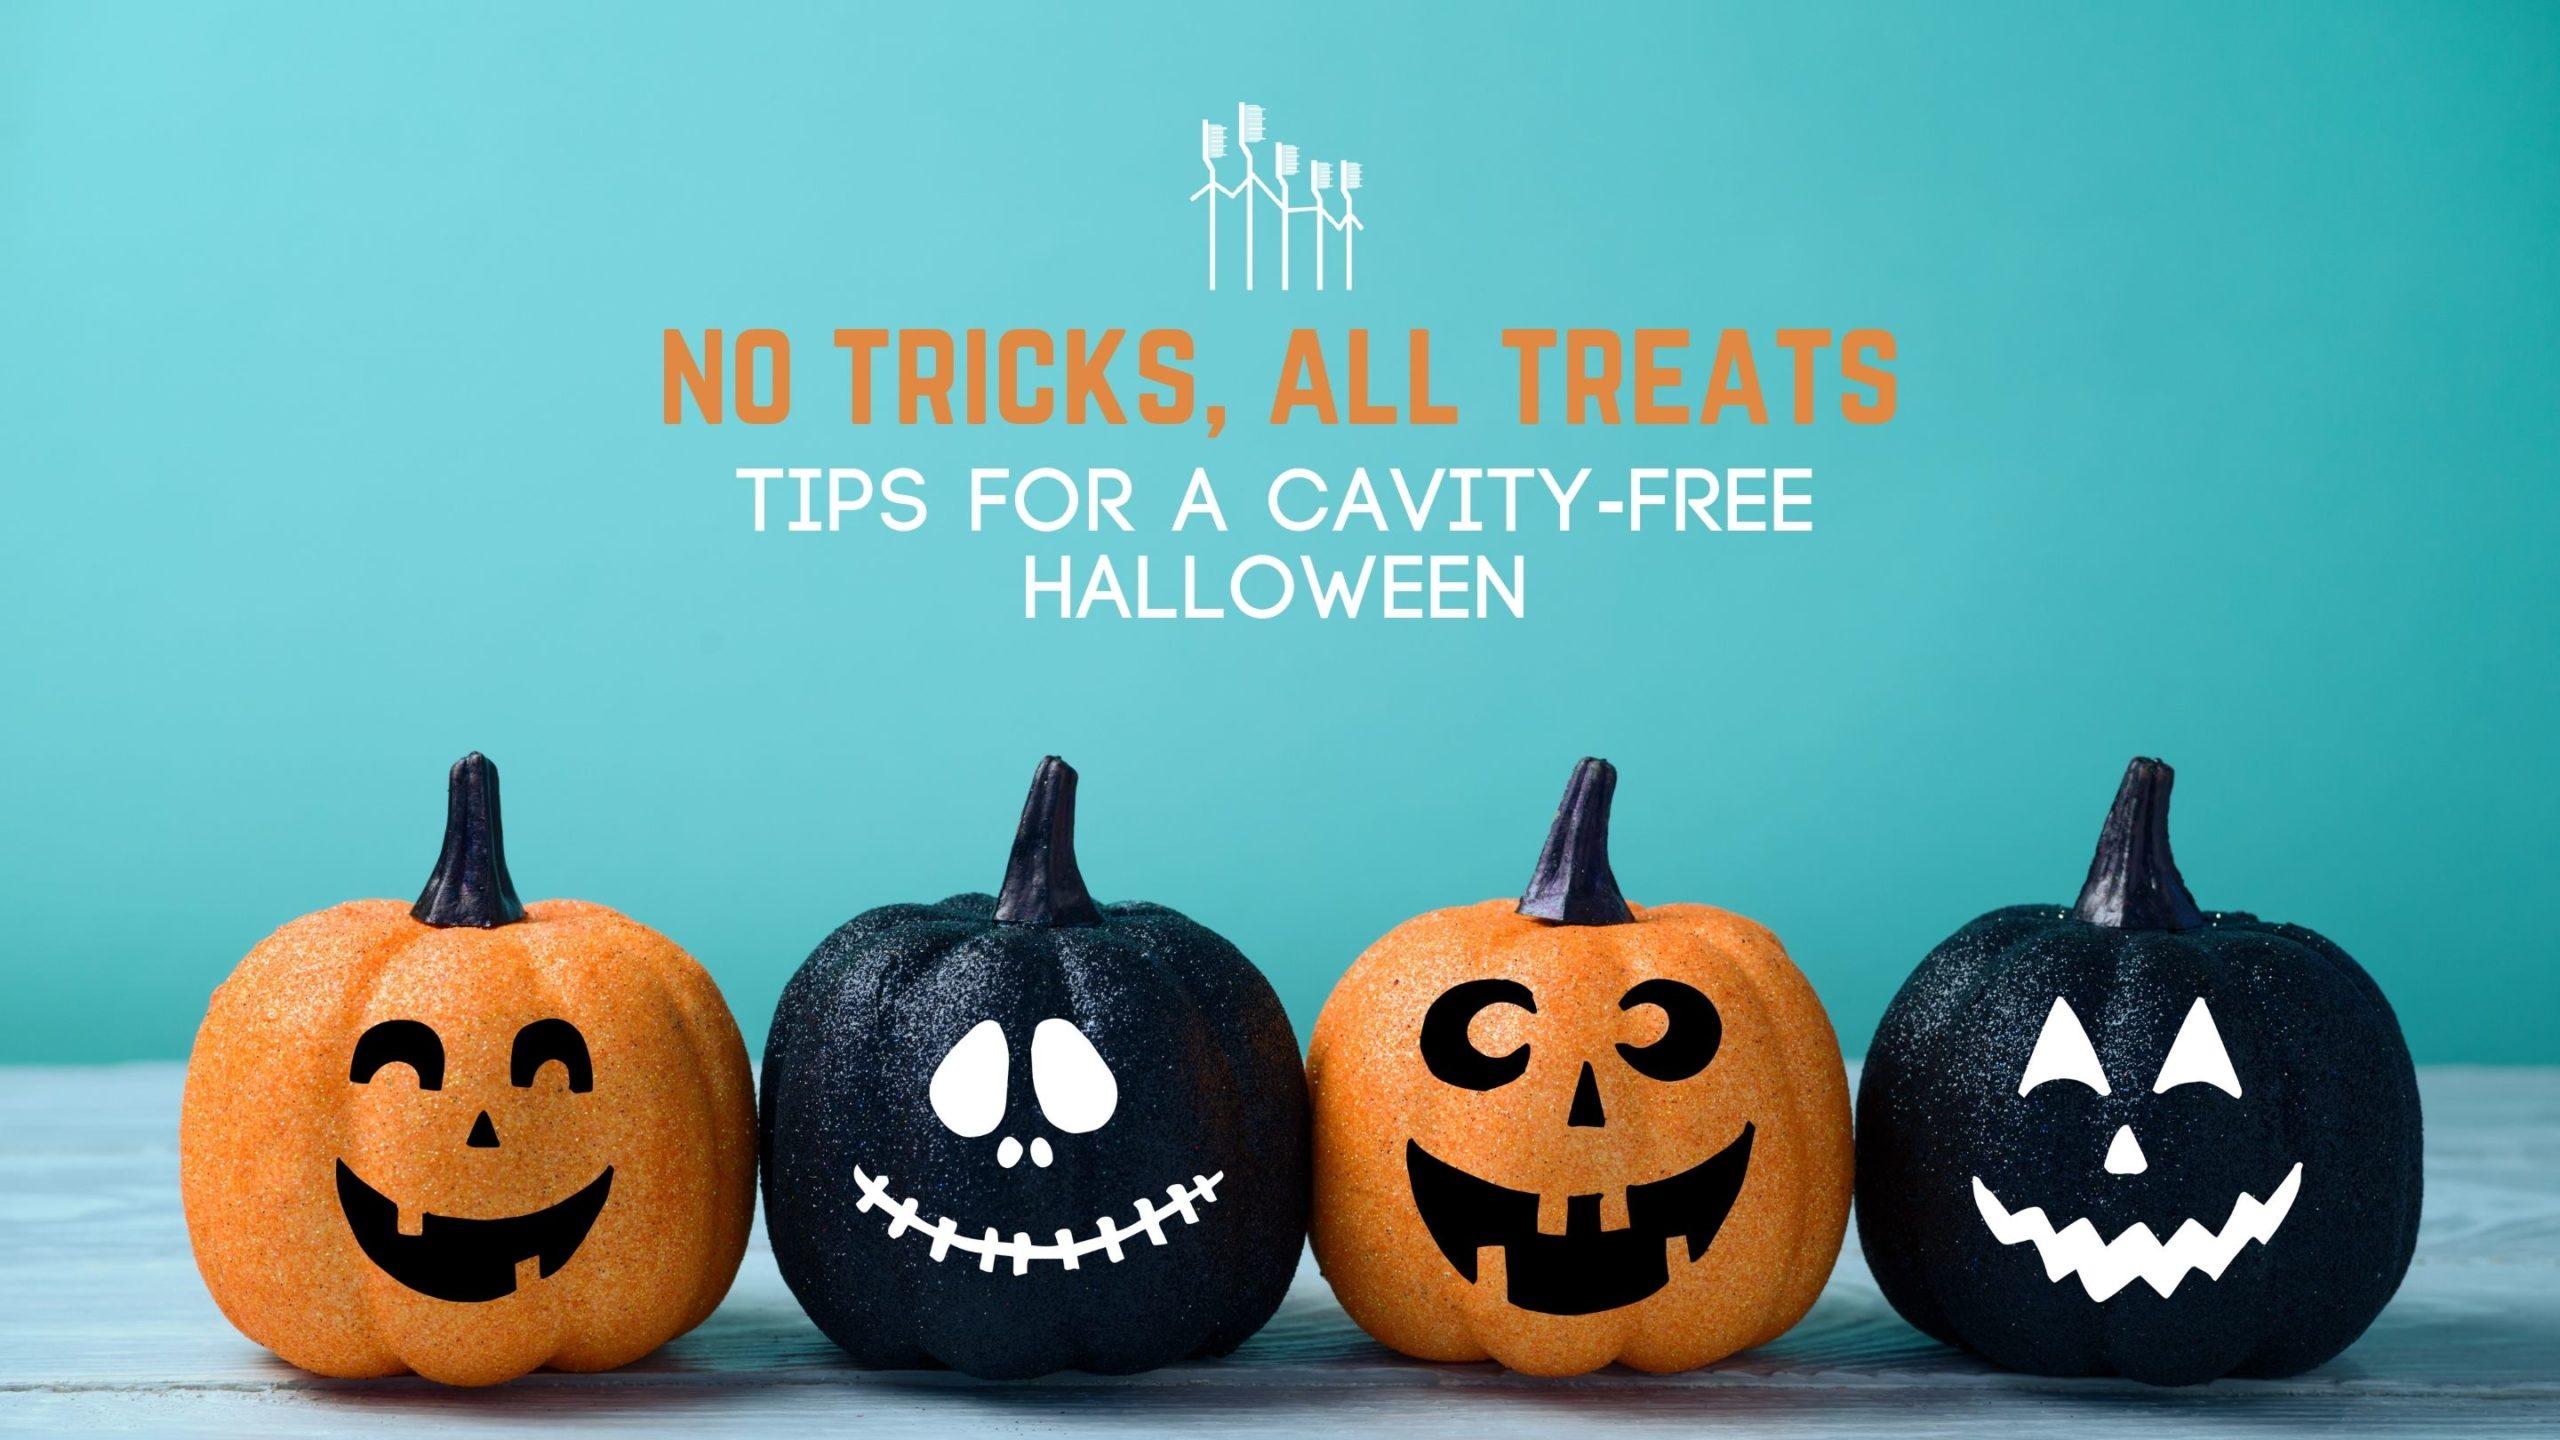 No Tricks, All Treats: Tips For A Cavity-Free Halloween